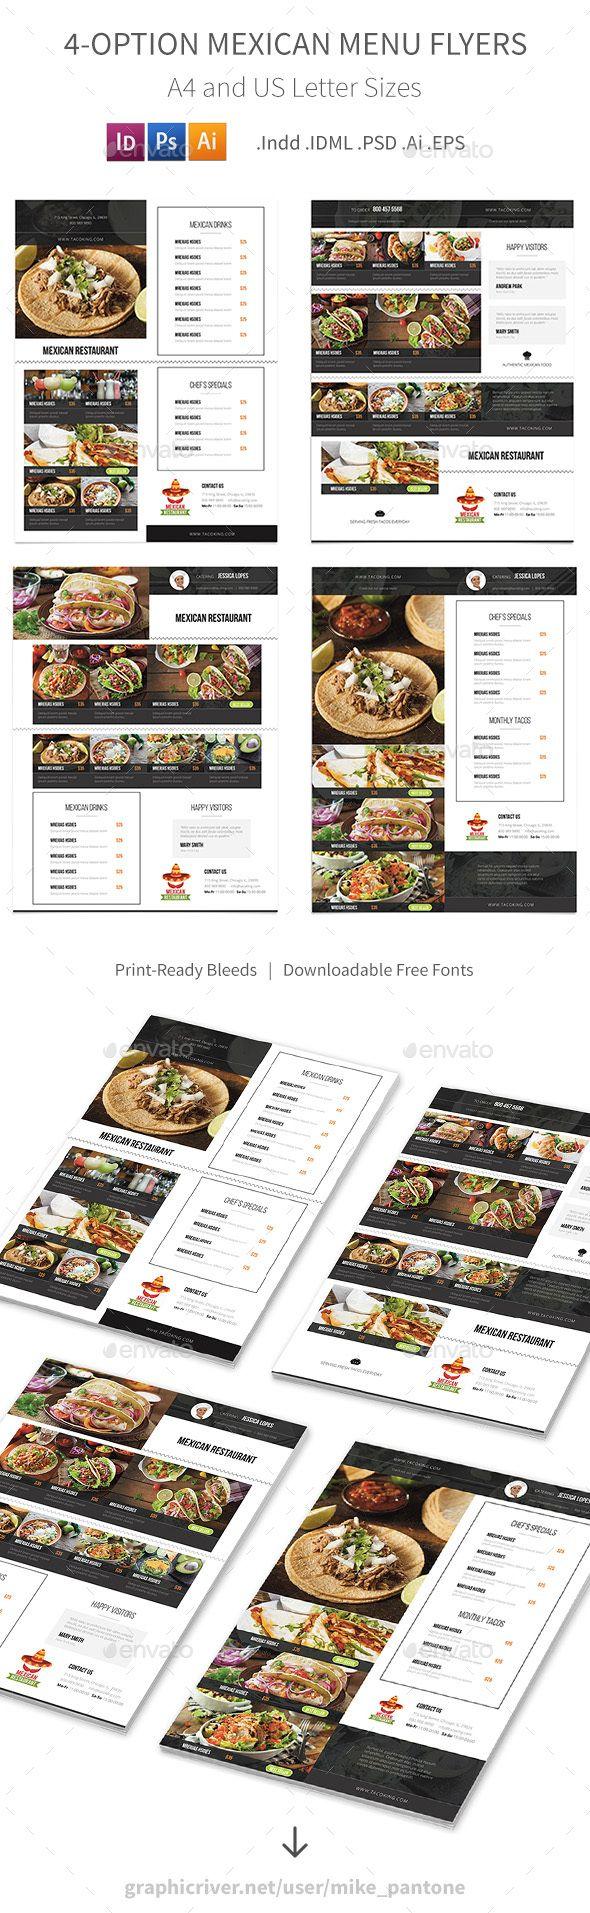 Mexican Restaurant Menu Flyers – 4 Options - Food Menus Print Templates Download here : https://graphicriver.net/item/mexican-restaurant-menu-flyers-4-options/19182517?s_rank=96&ref=Al-fatih